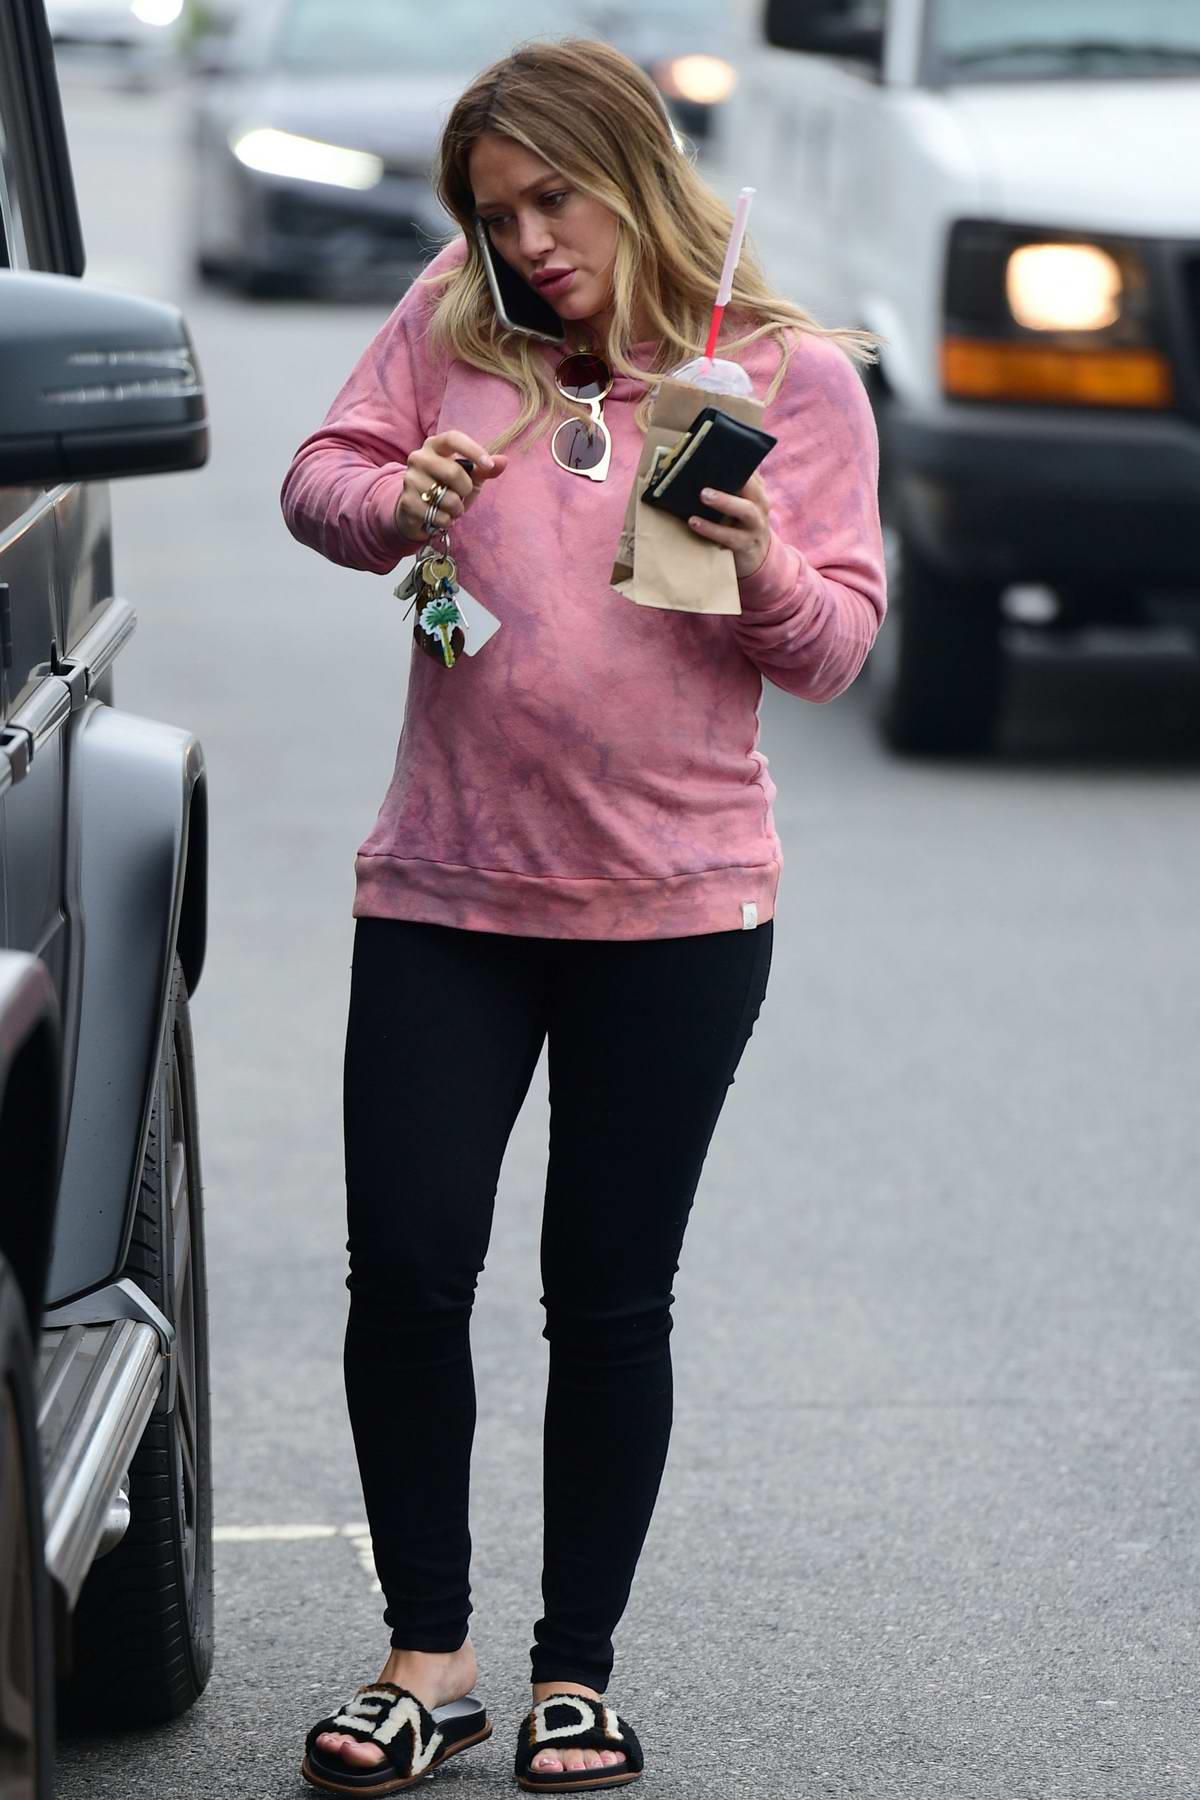 Hilary Duff seen wearing a pink sweatshirt and Fendi flip flops as she grabs a breakfast smoothie in Los Angeles